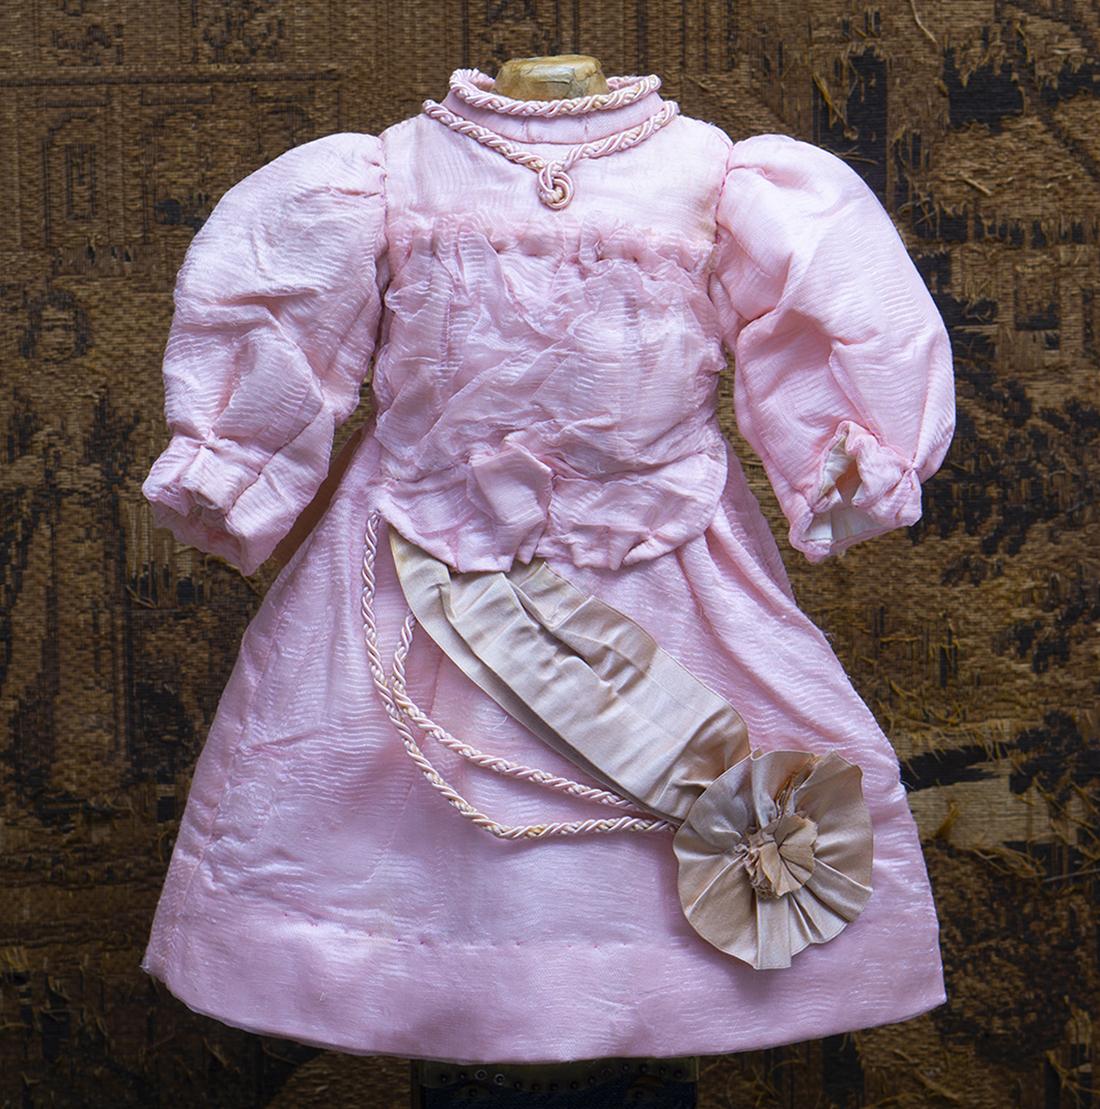 Antique doll dress